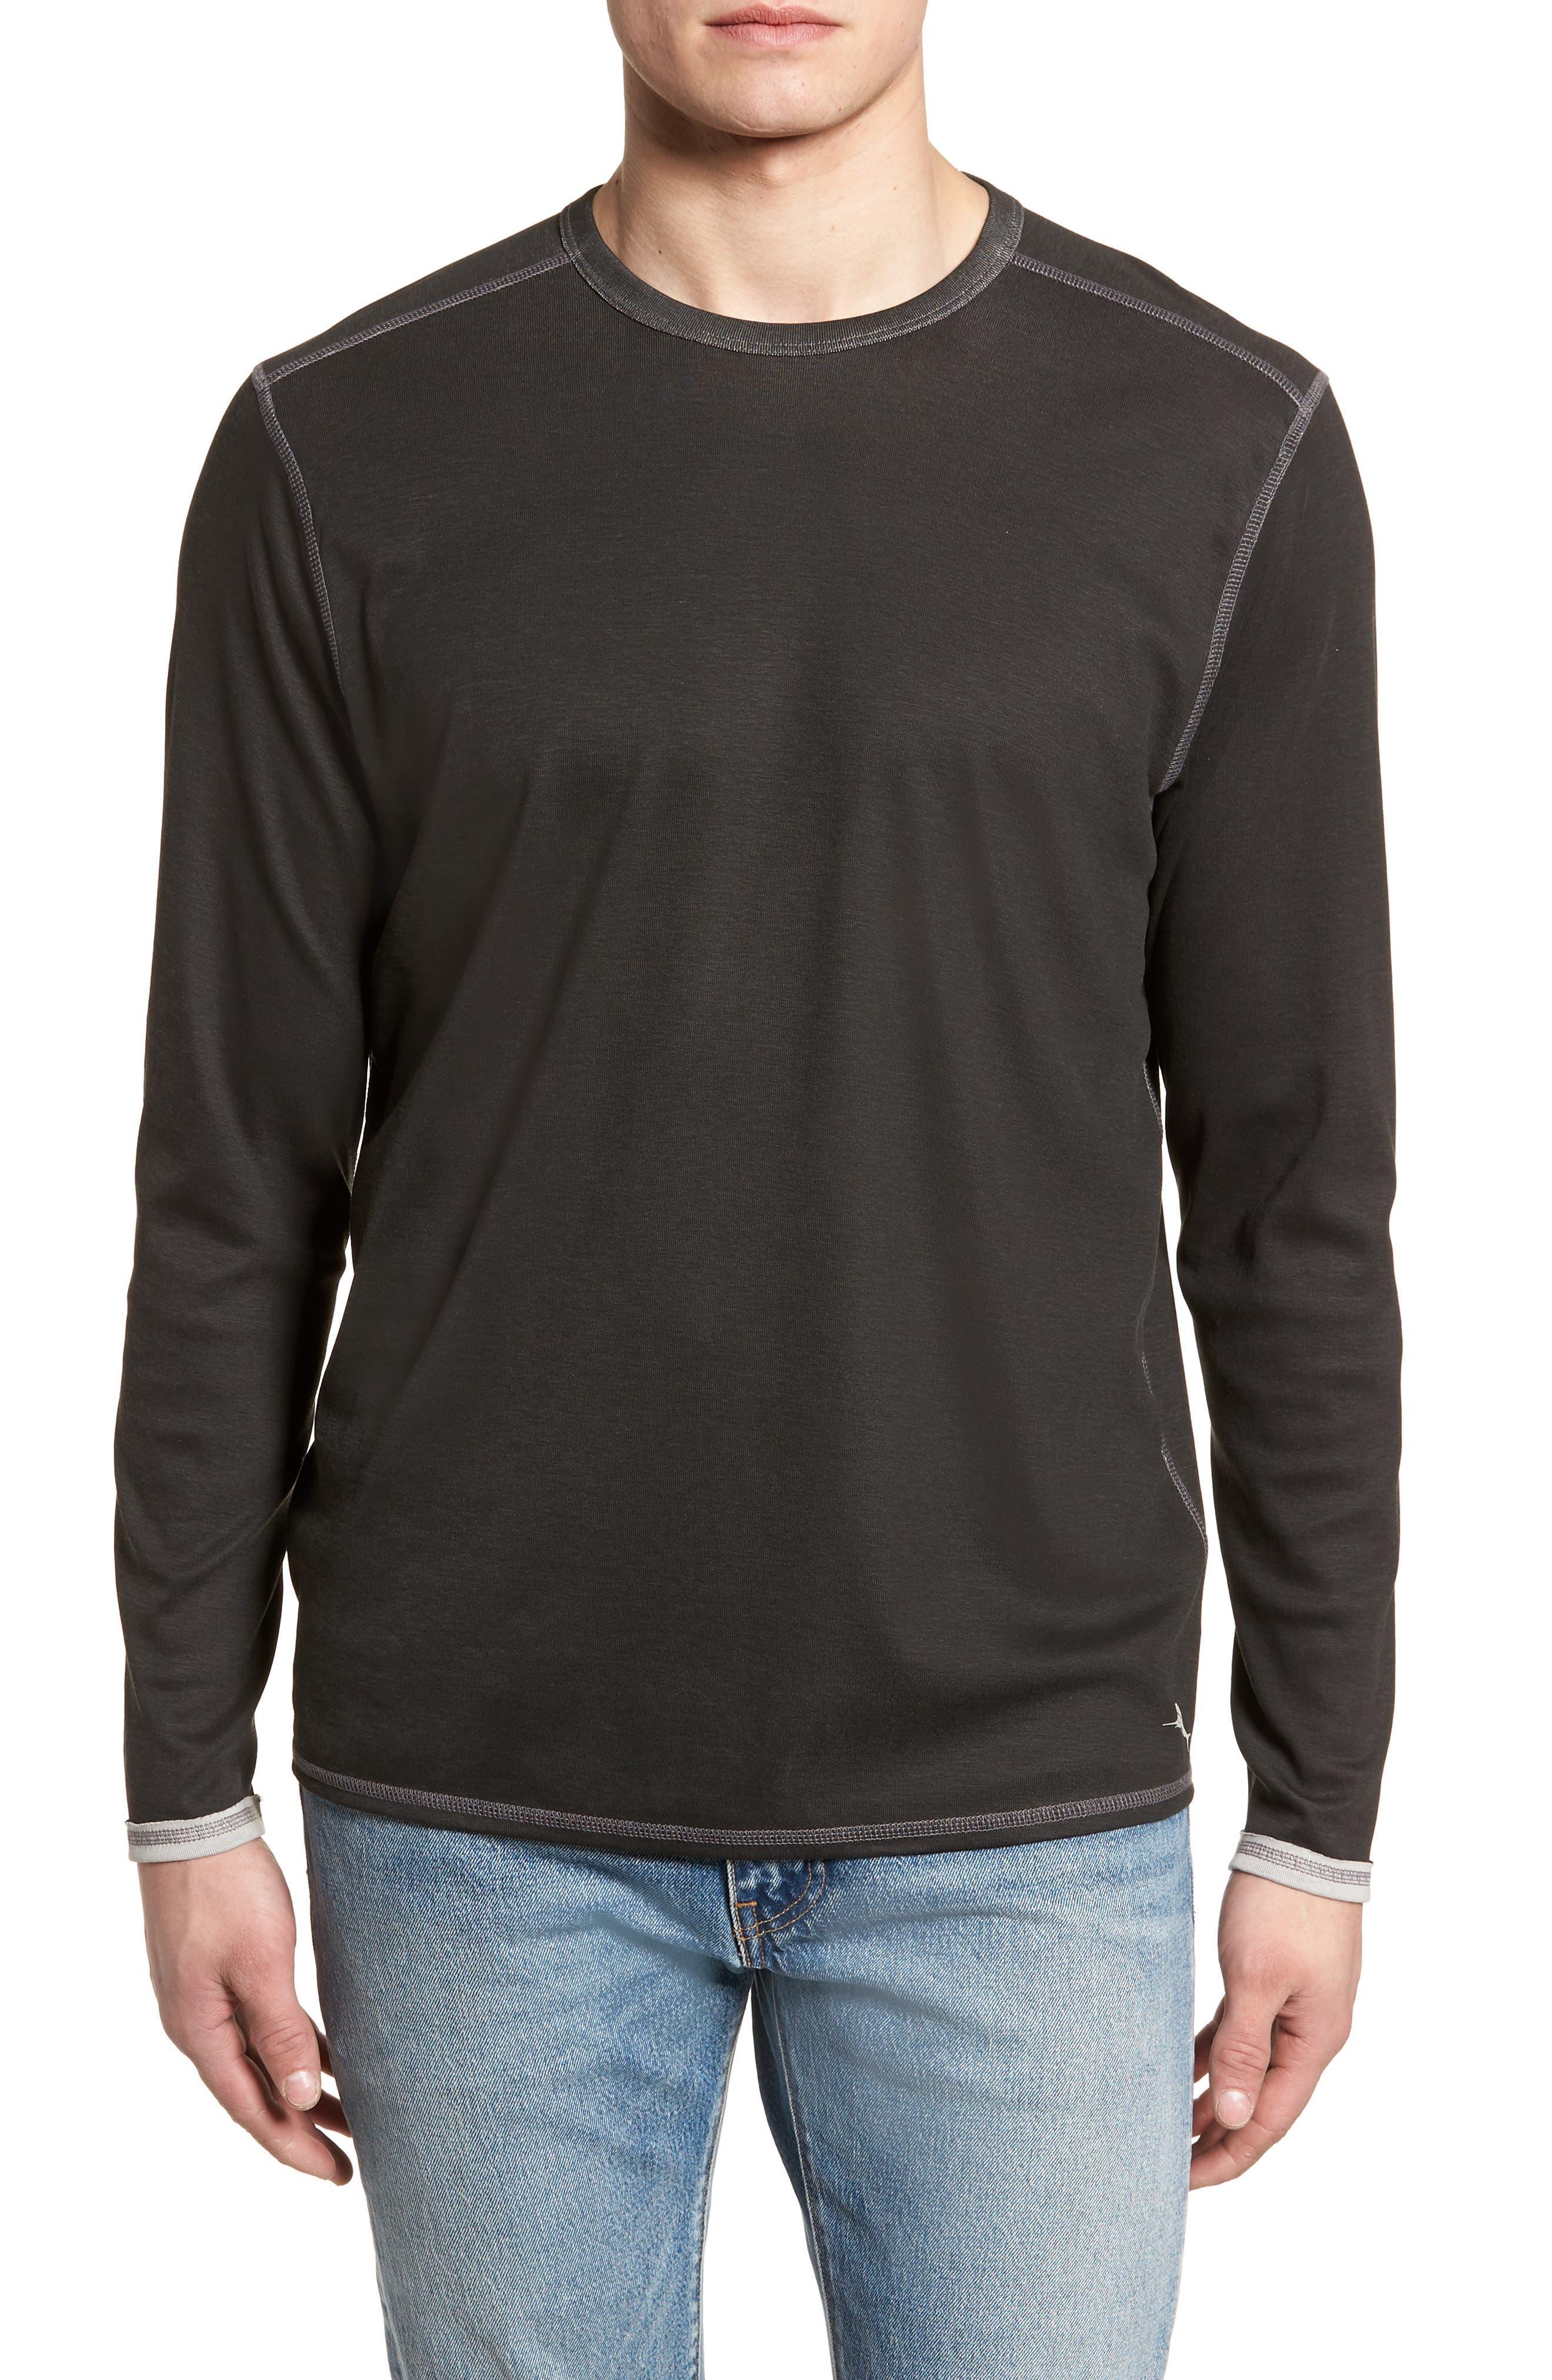 Dual in the Sun Reversible T-Shirt,                             Main thumbnail 1, color,                             001